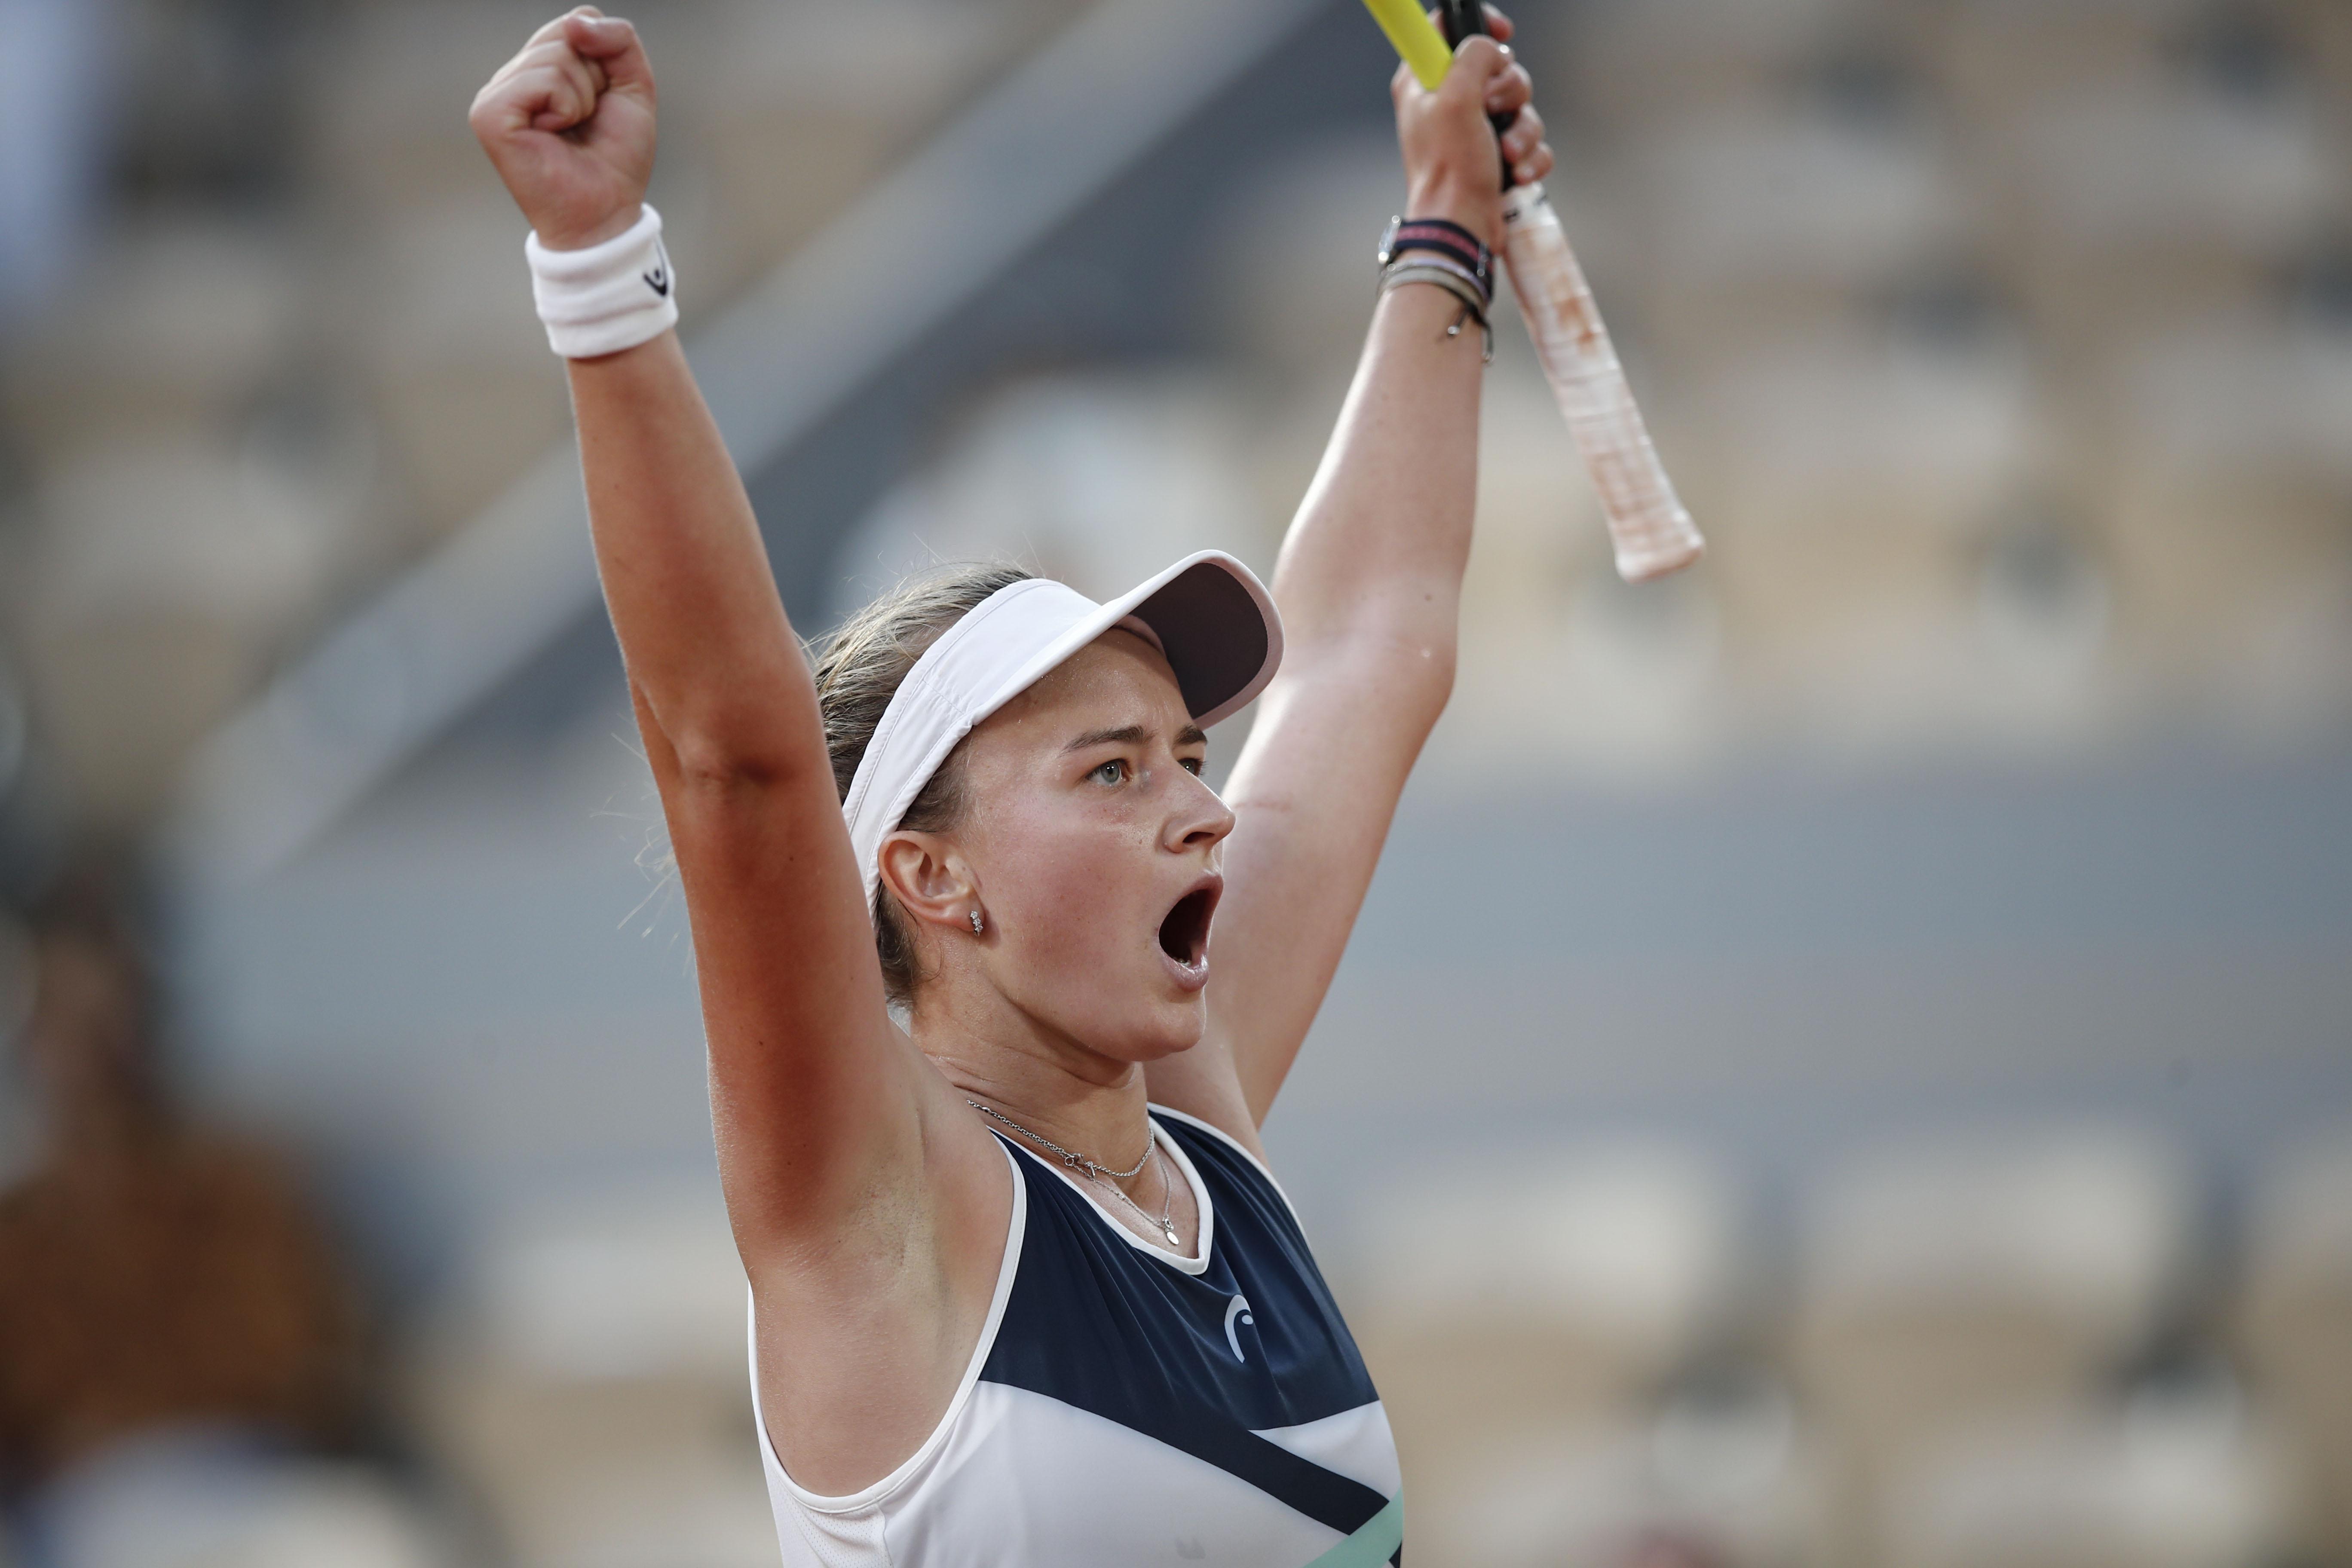 Tennis - French Open - Roland Garros, Paris, France - June 10, 2021 Czech Republic's Barbora Krejcikova celebrates winning her semi final match against Greece's Maria Sakkari REUTERS/Benoit Tessier